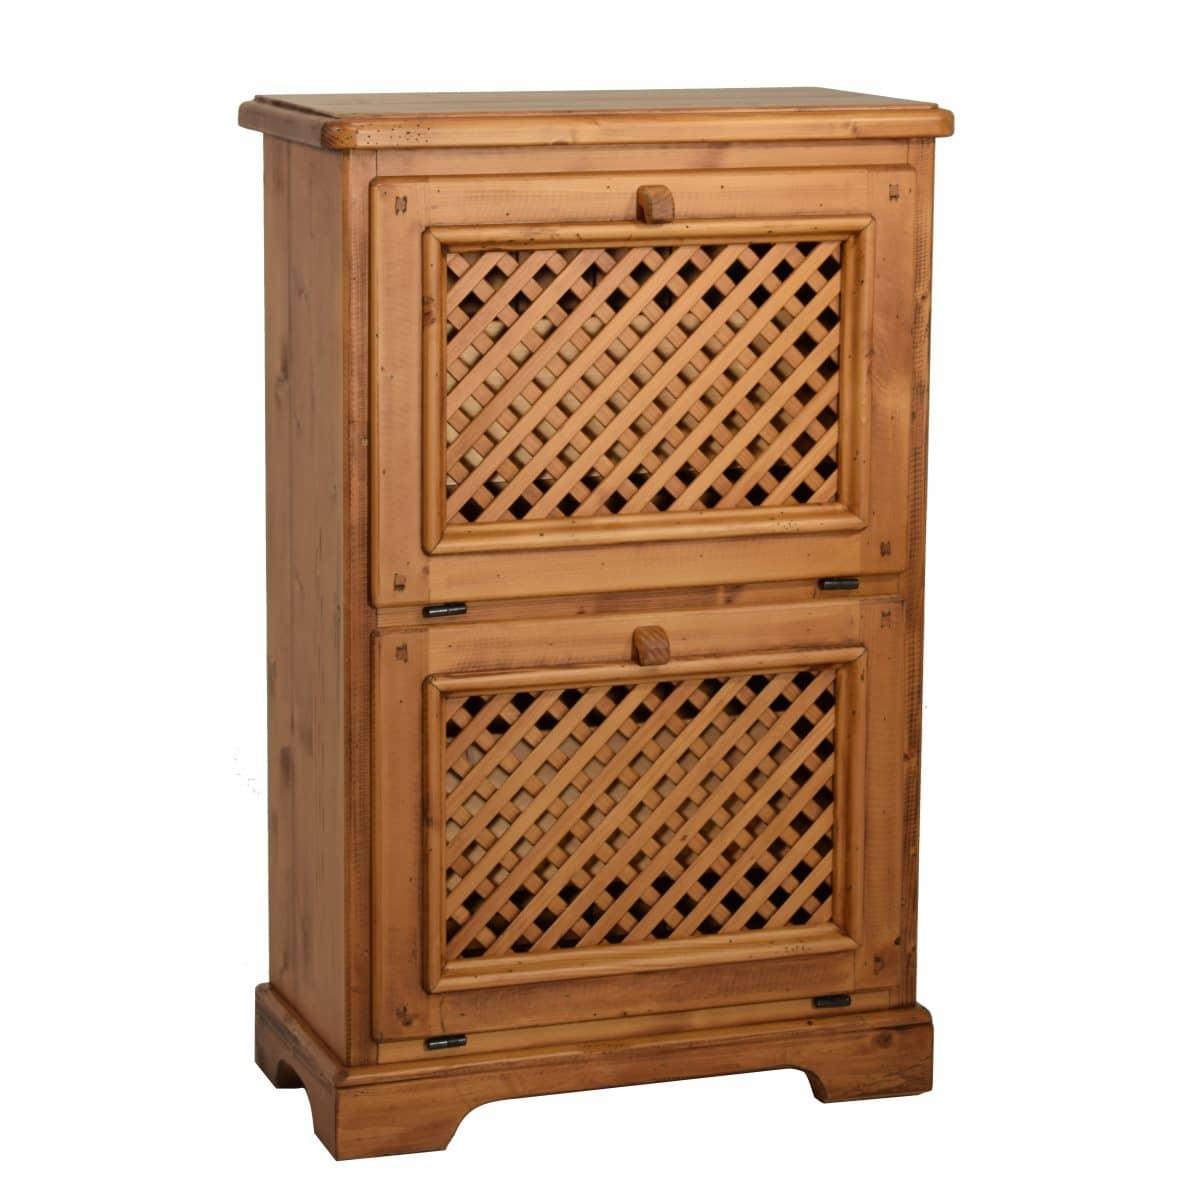 Zapatero r stico de madera ecor stico venta de muebles - Botelleros de madera rusticos ...